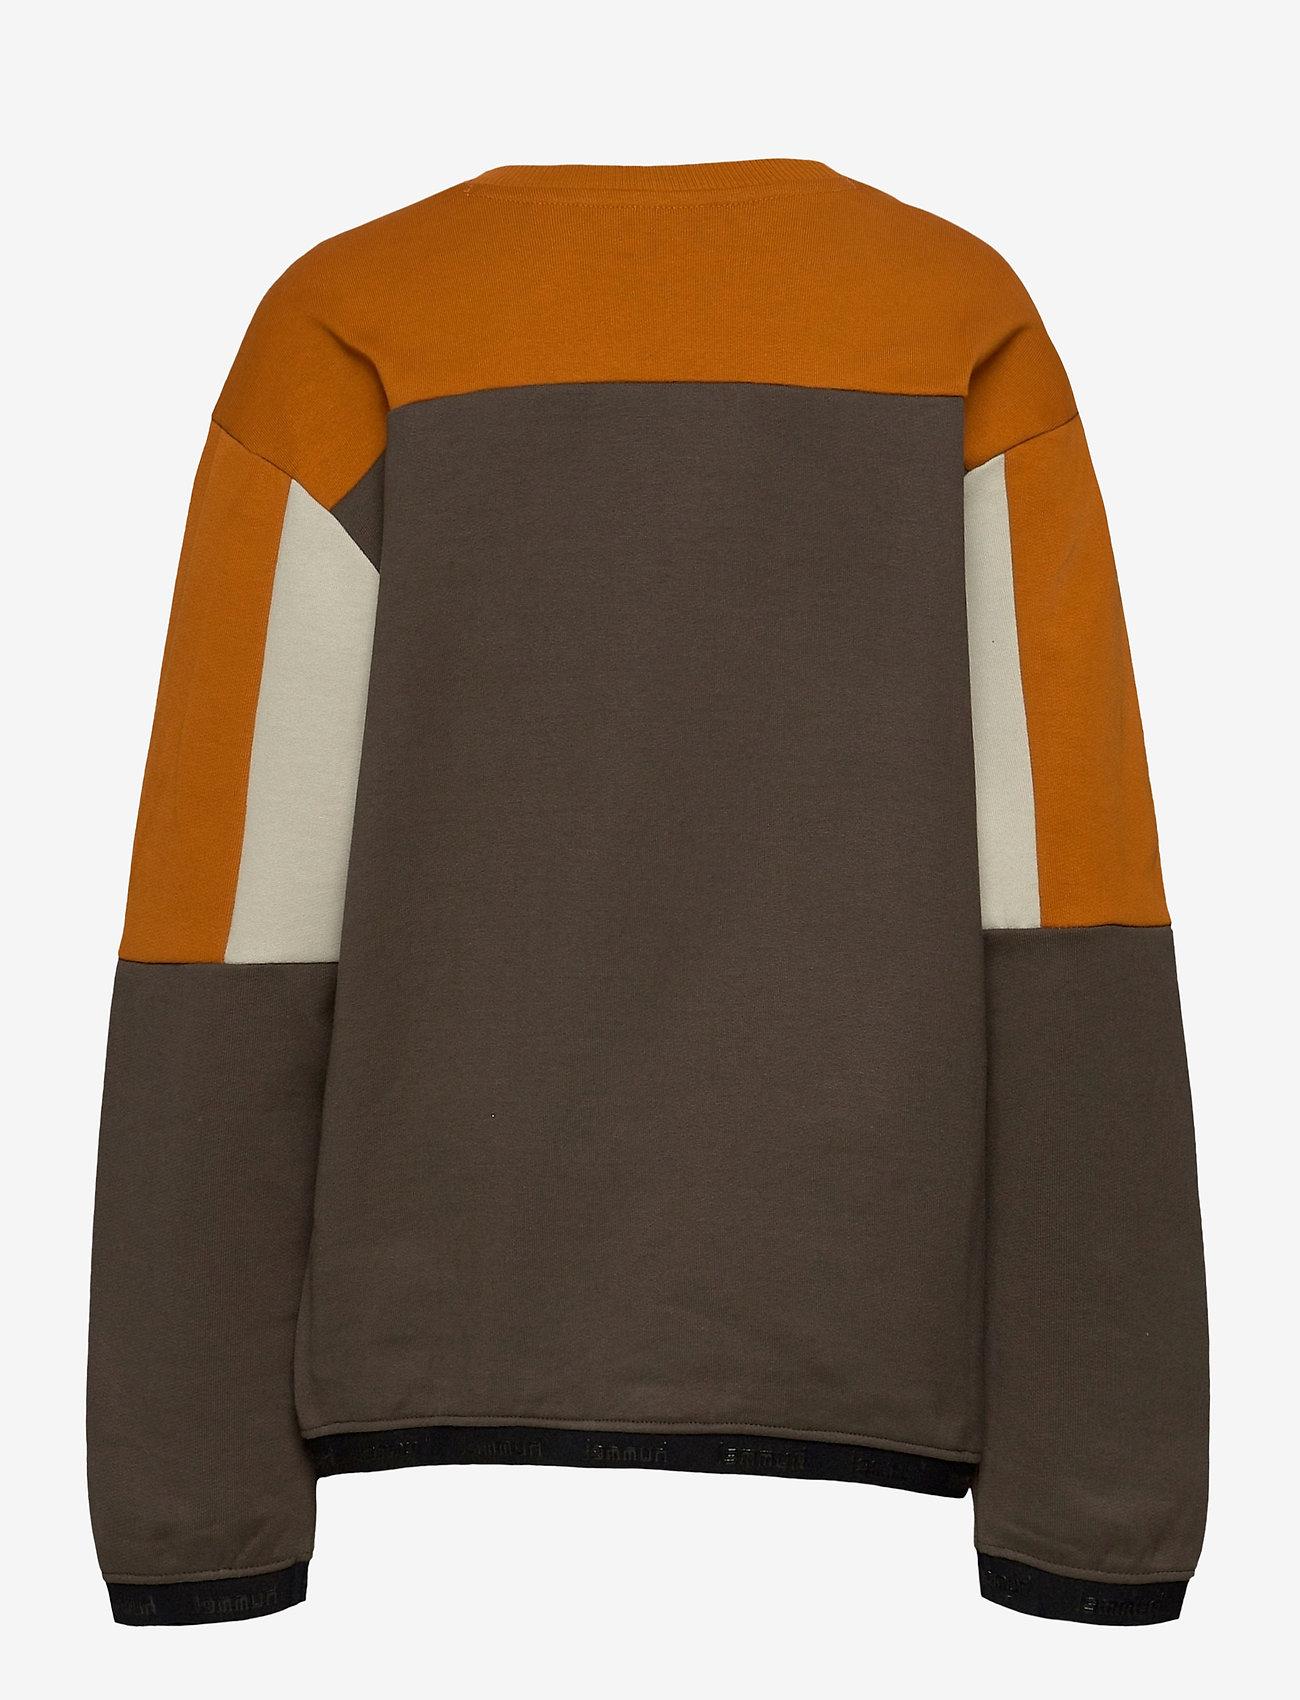 Hummel - hmlSANDER SWEATSHIRT - sweatshirts - black olive - 1